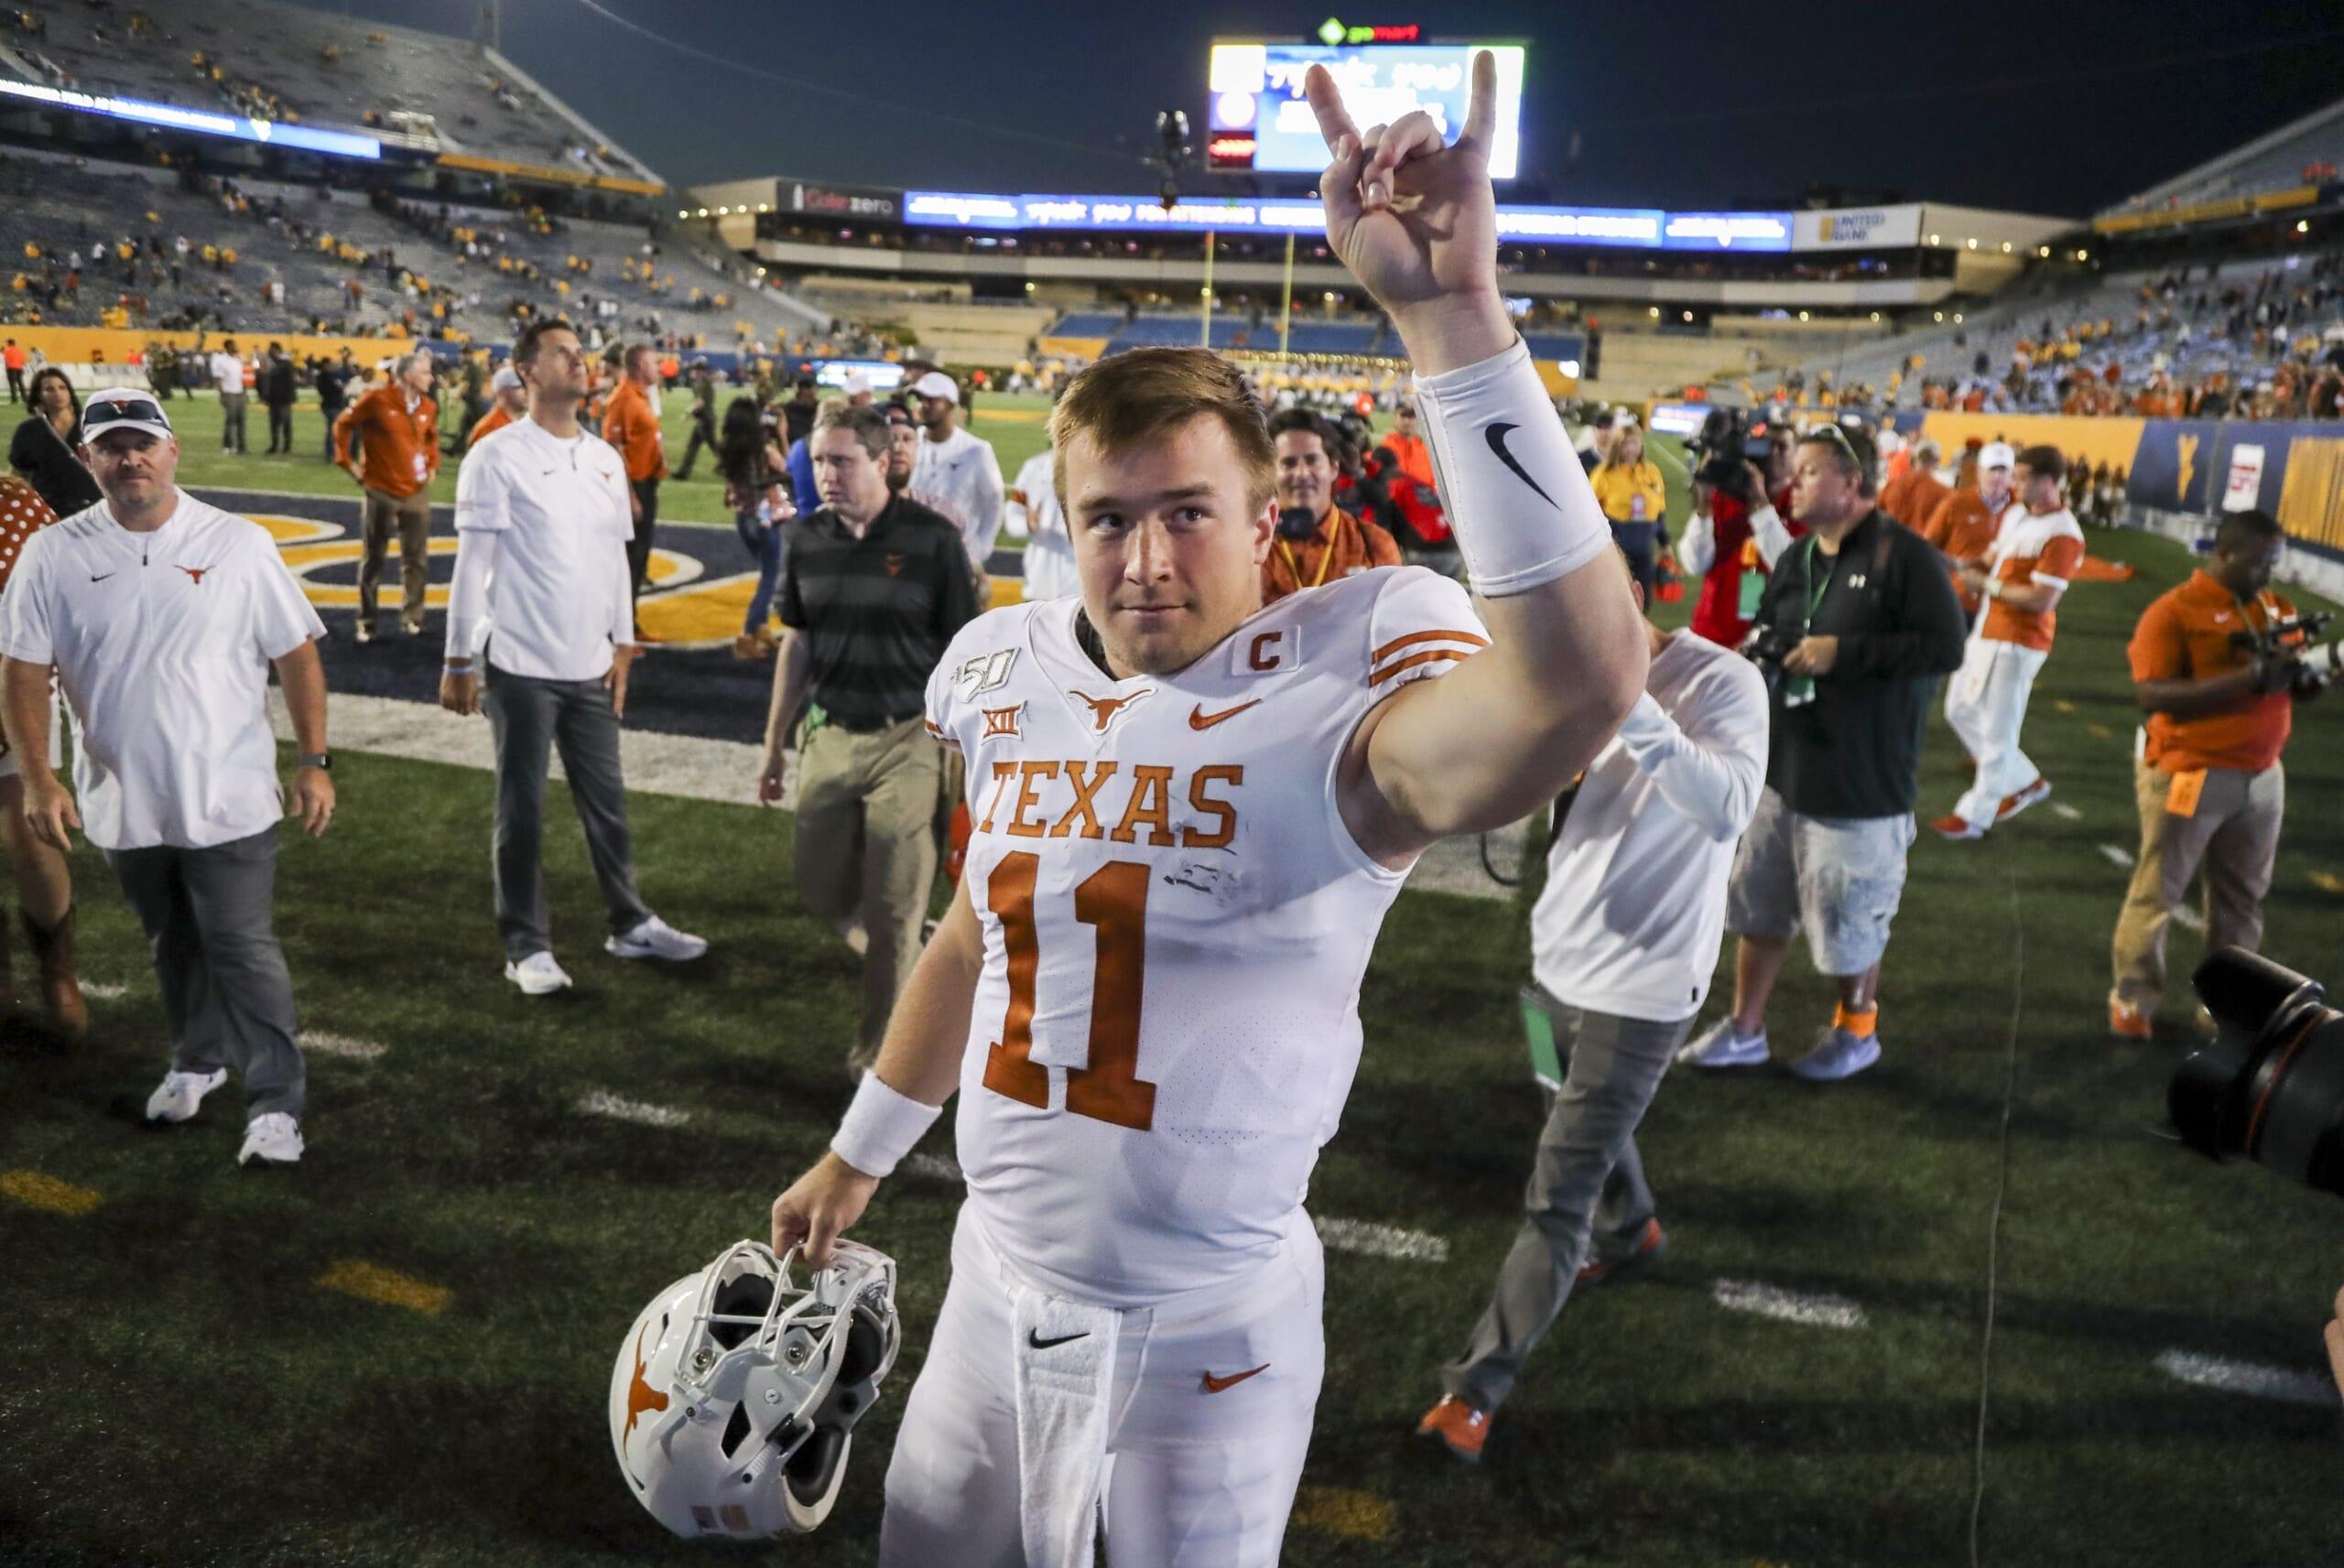 Texas Longhorns Qb Sam Ehlinger Announces Covid 19 Fundraiser Garnered 200k